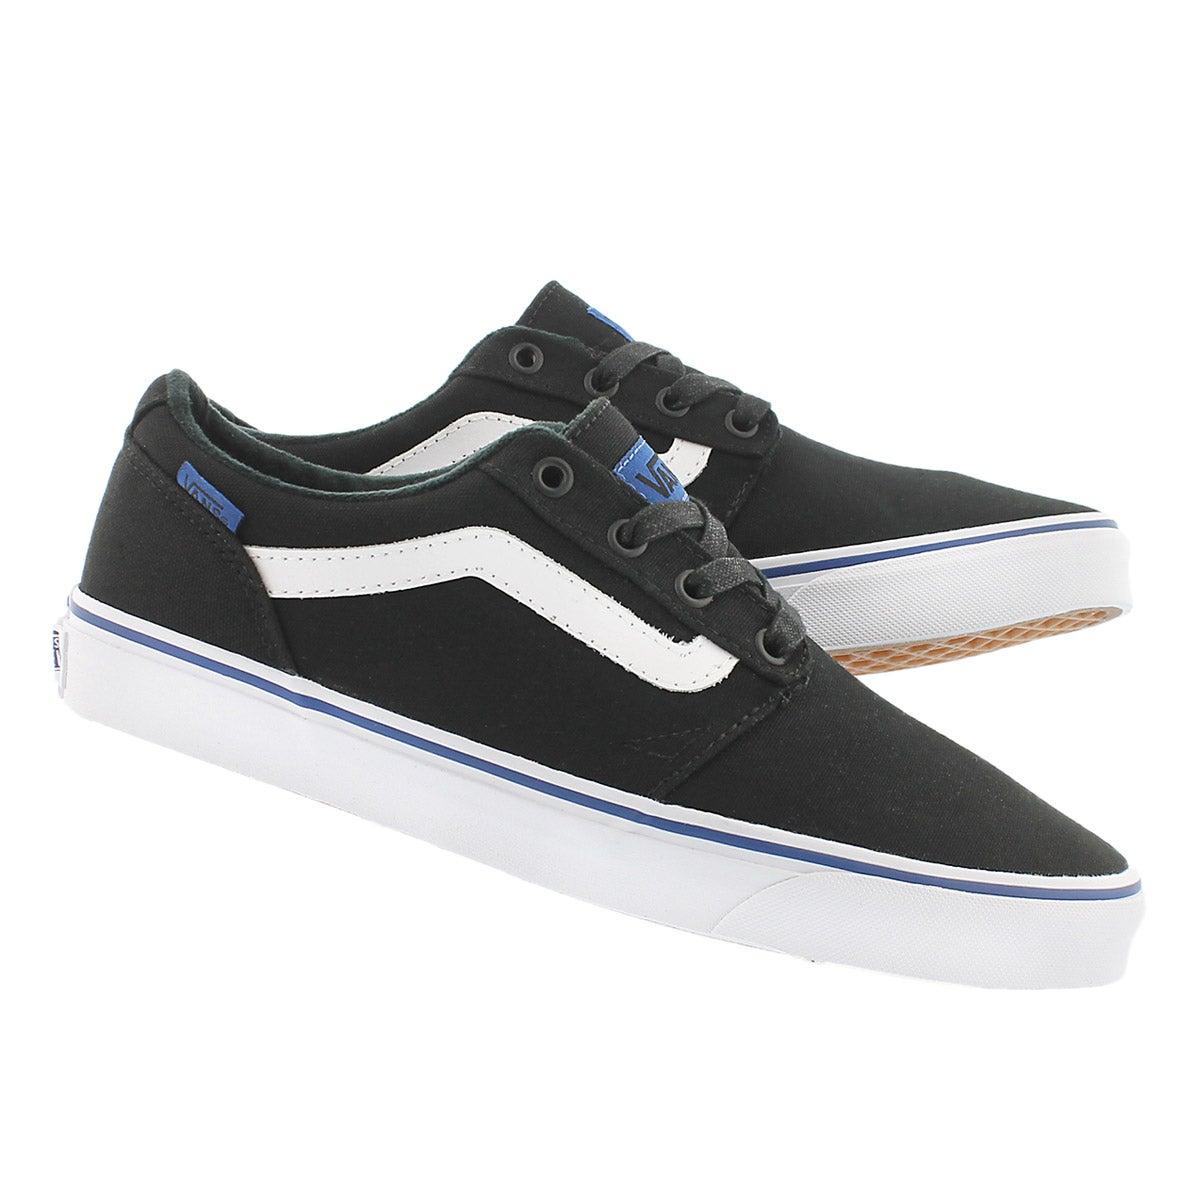 Mns Chapman Stripe blk/blu sneaker